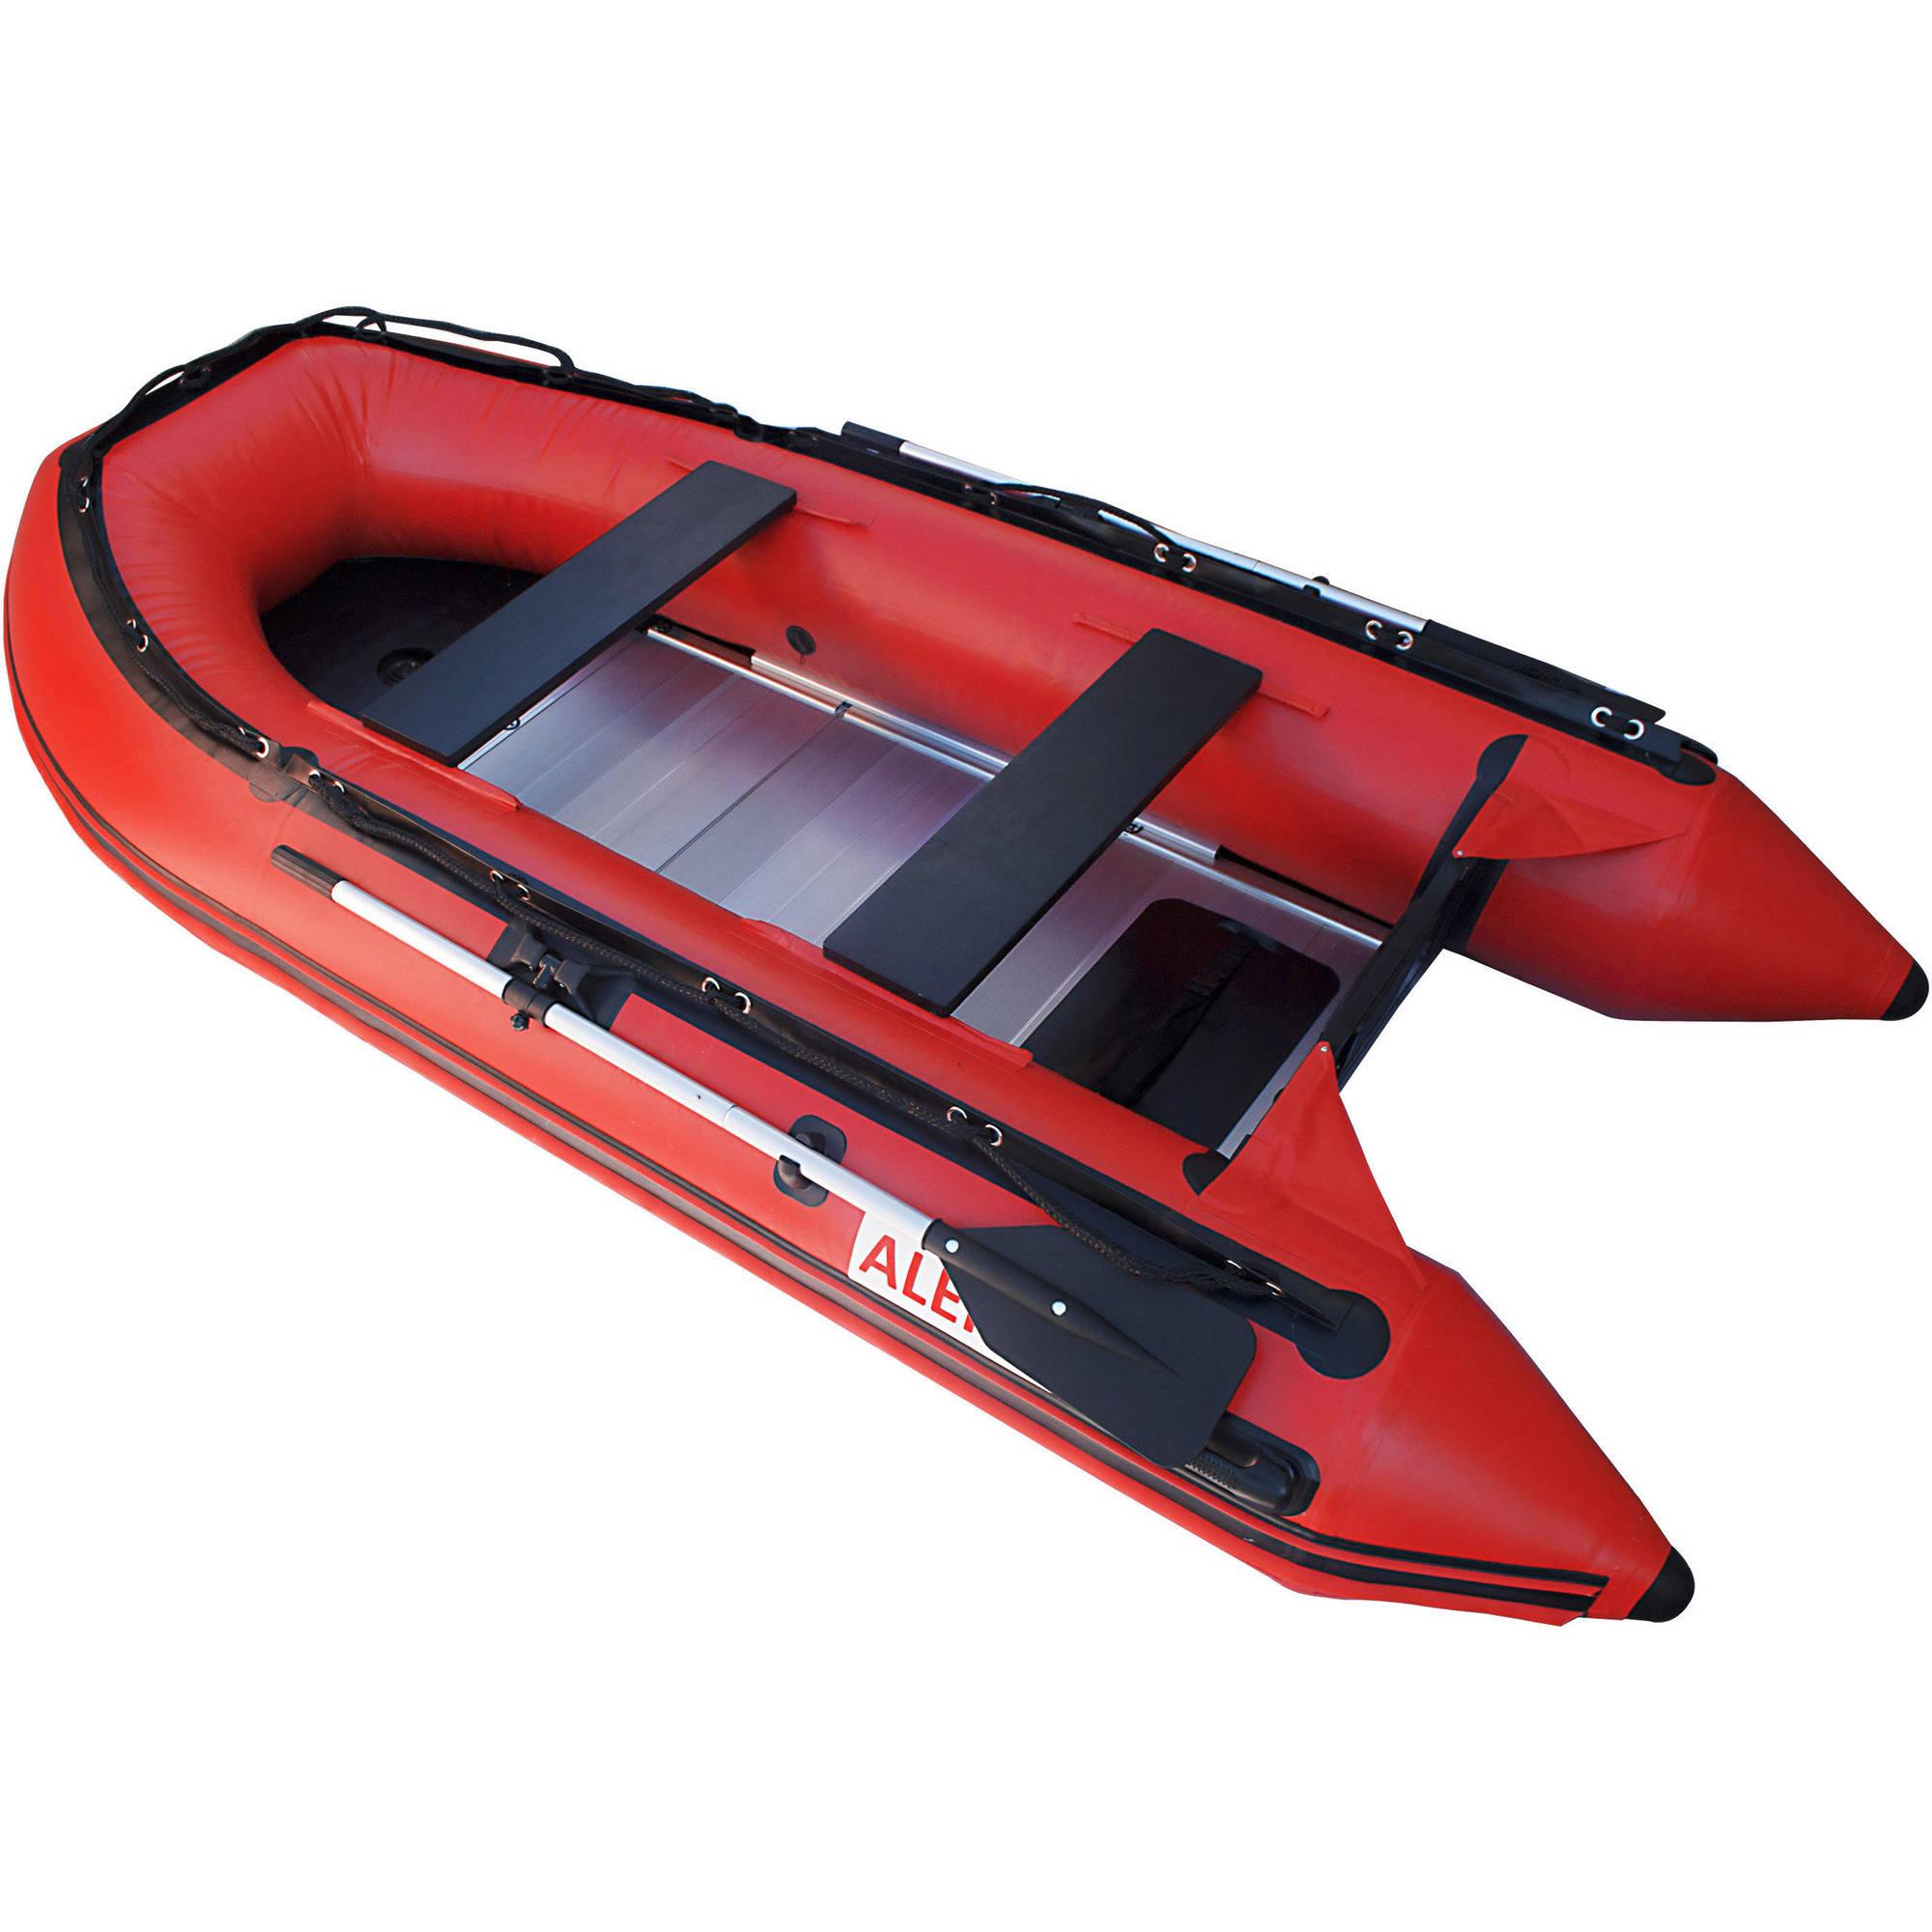 ALEKO Inflatable Boat - Aluminum Floor - 12.5 Feet - Red